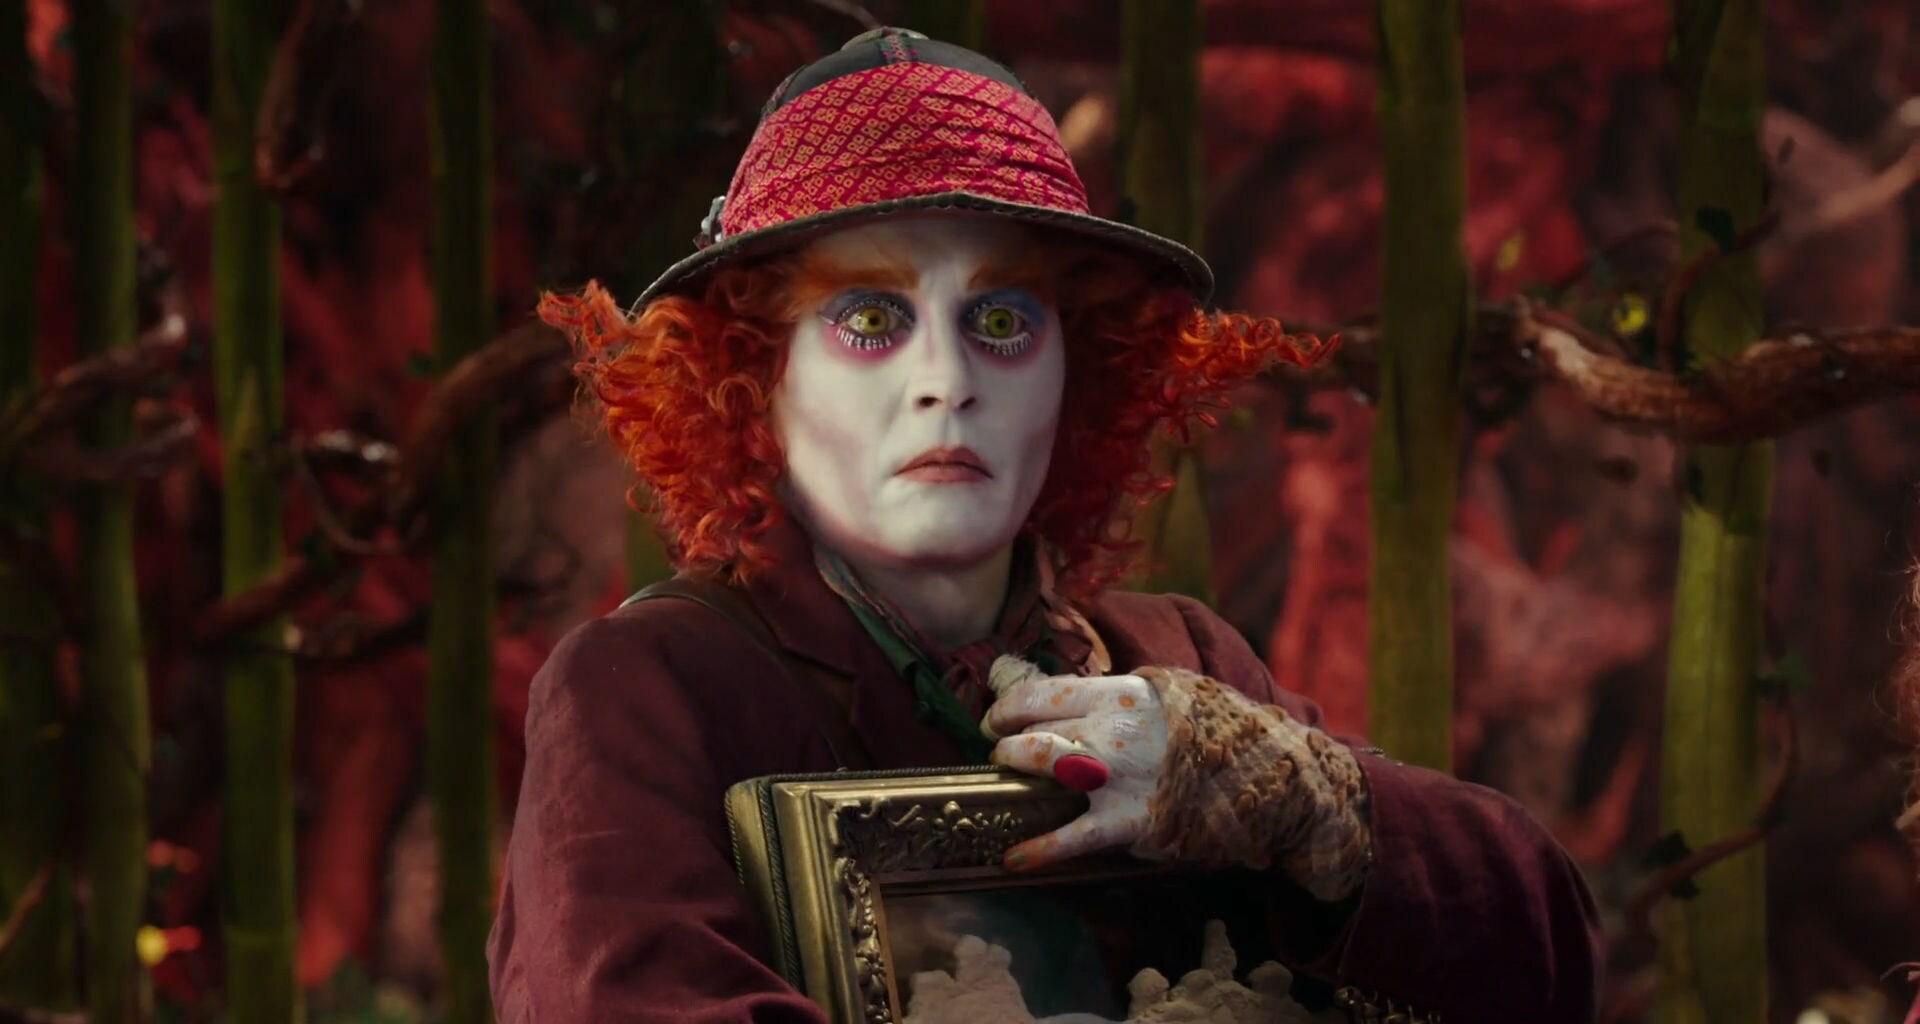 Alice i Eventyrland: Bag Spejlet - trailer